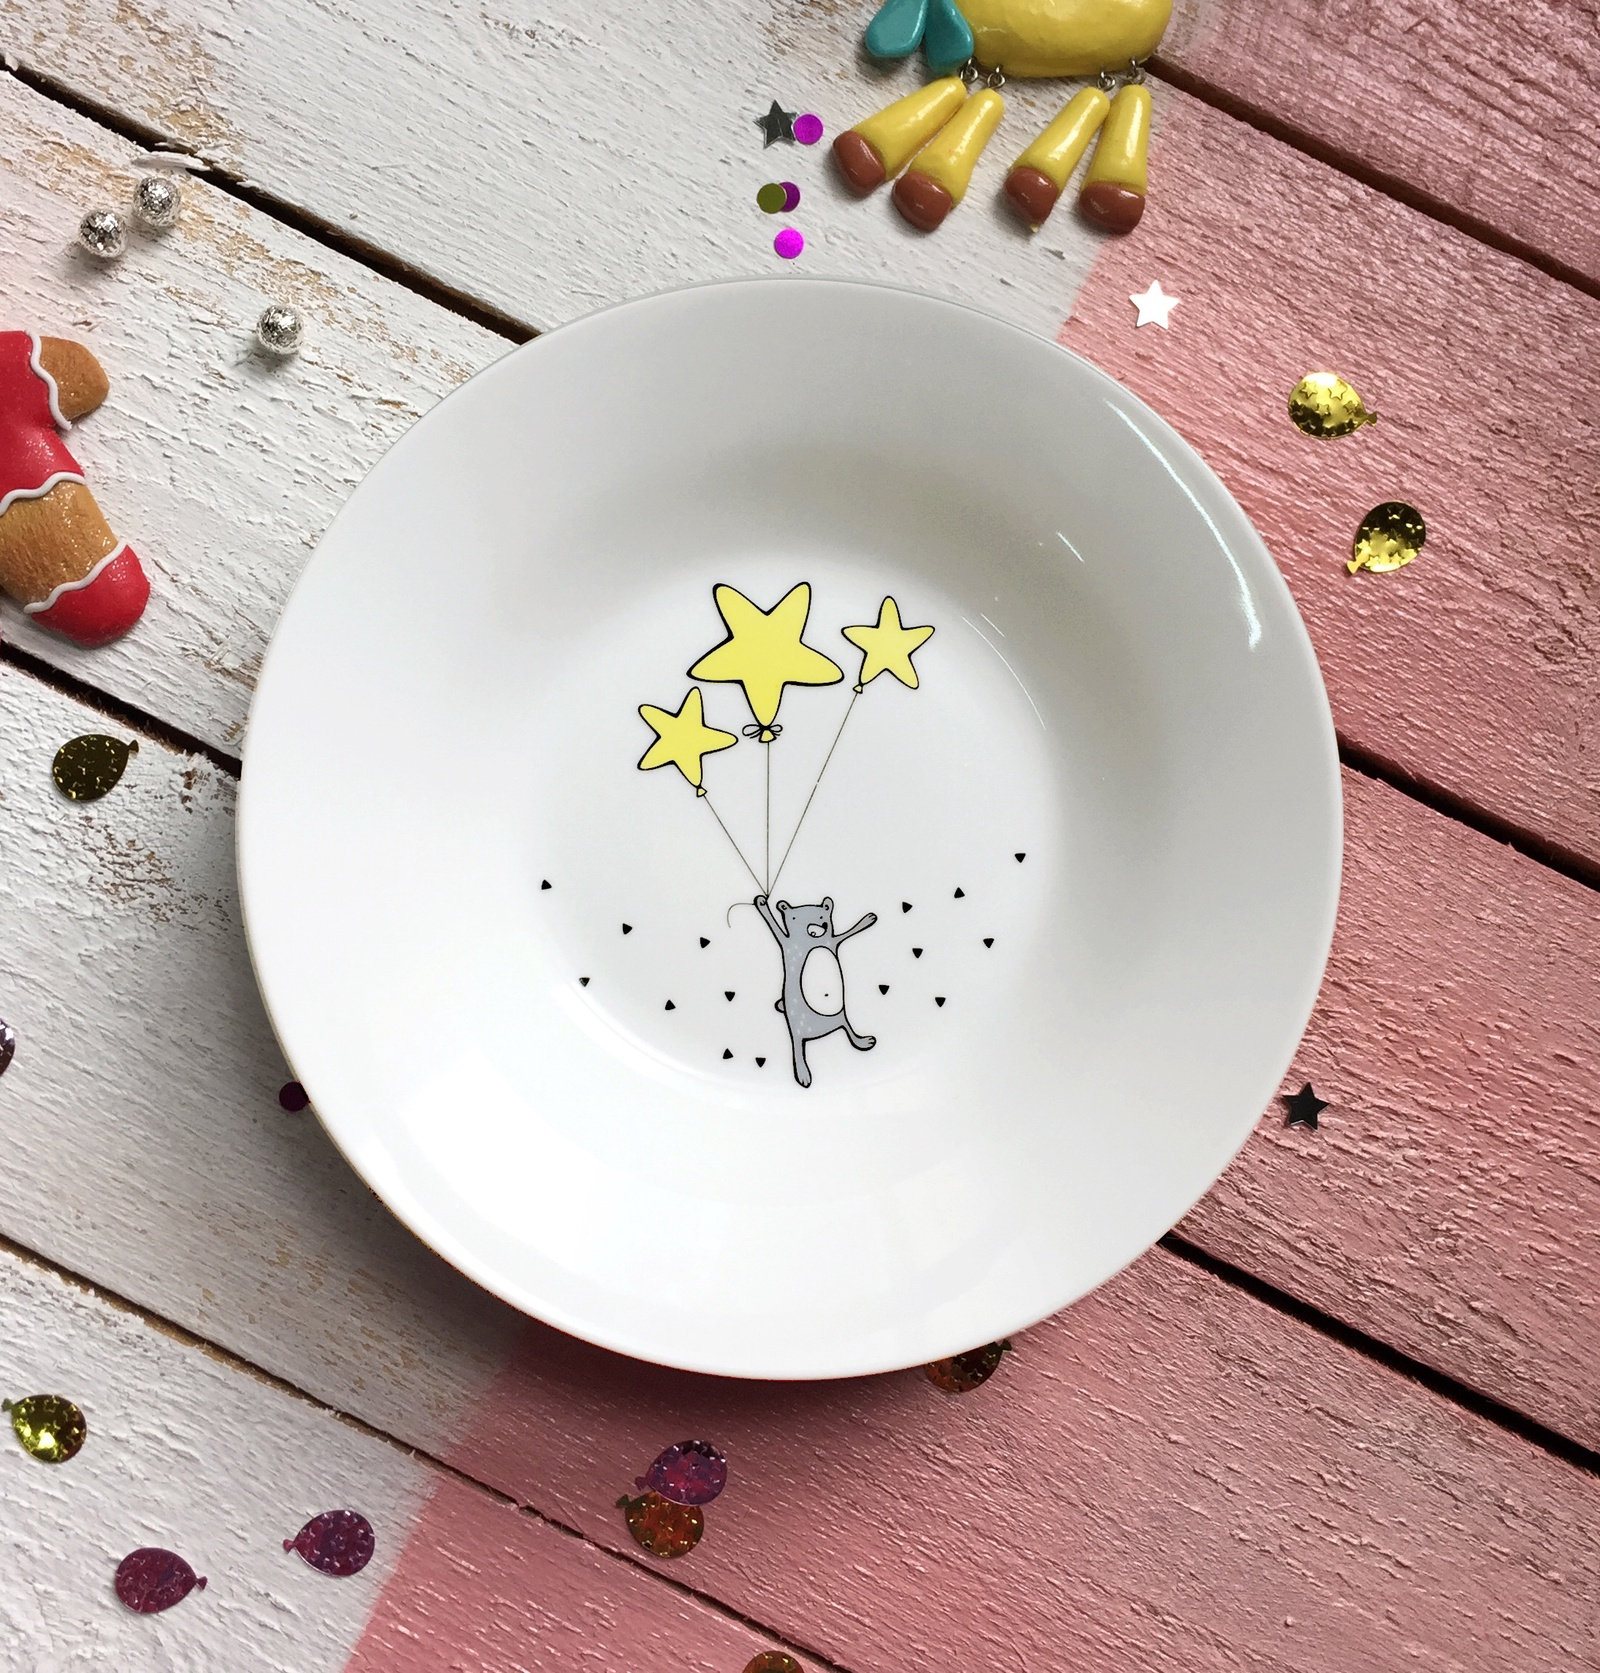 Тарелка глубокая Сотвори Чудо Звёздный мишка 20 см, белый тарелка мелкая сотвори чудо бананы диаметр 20 см